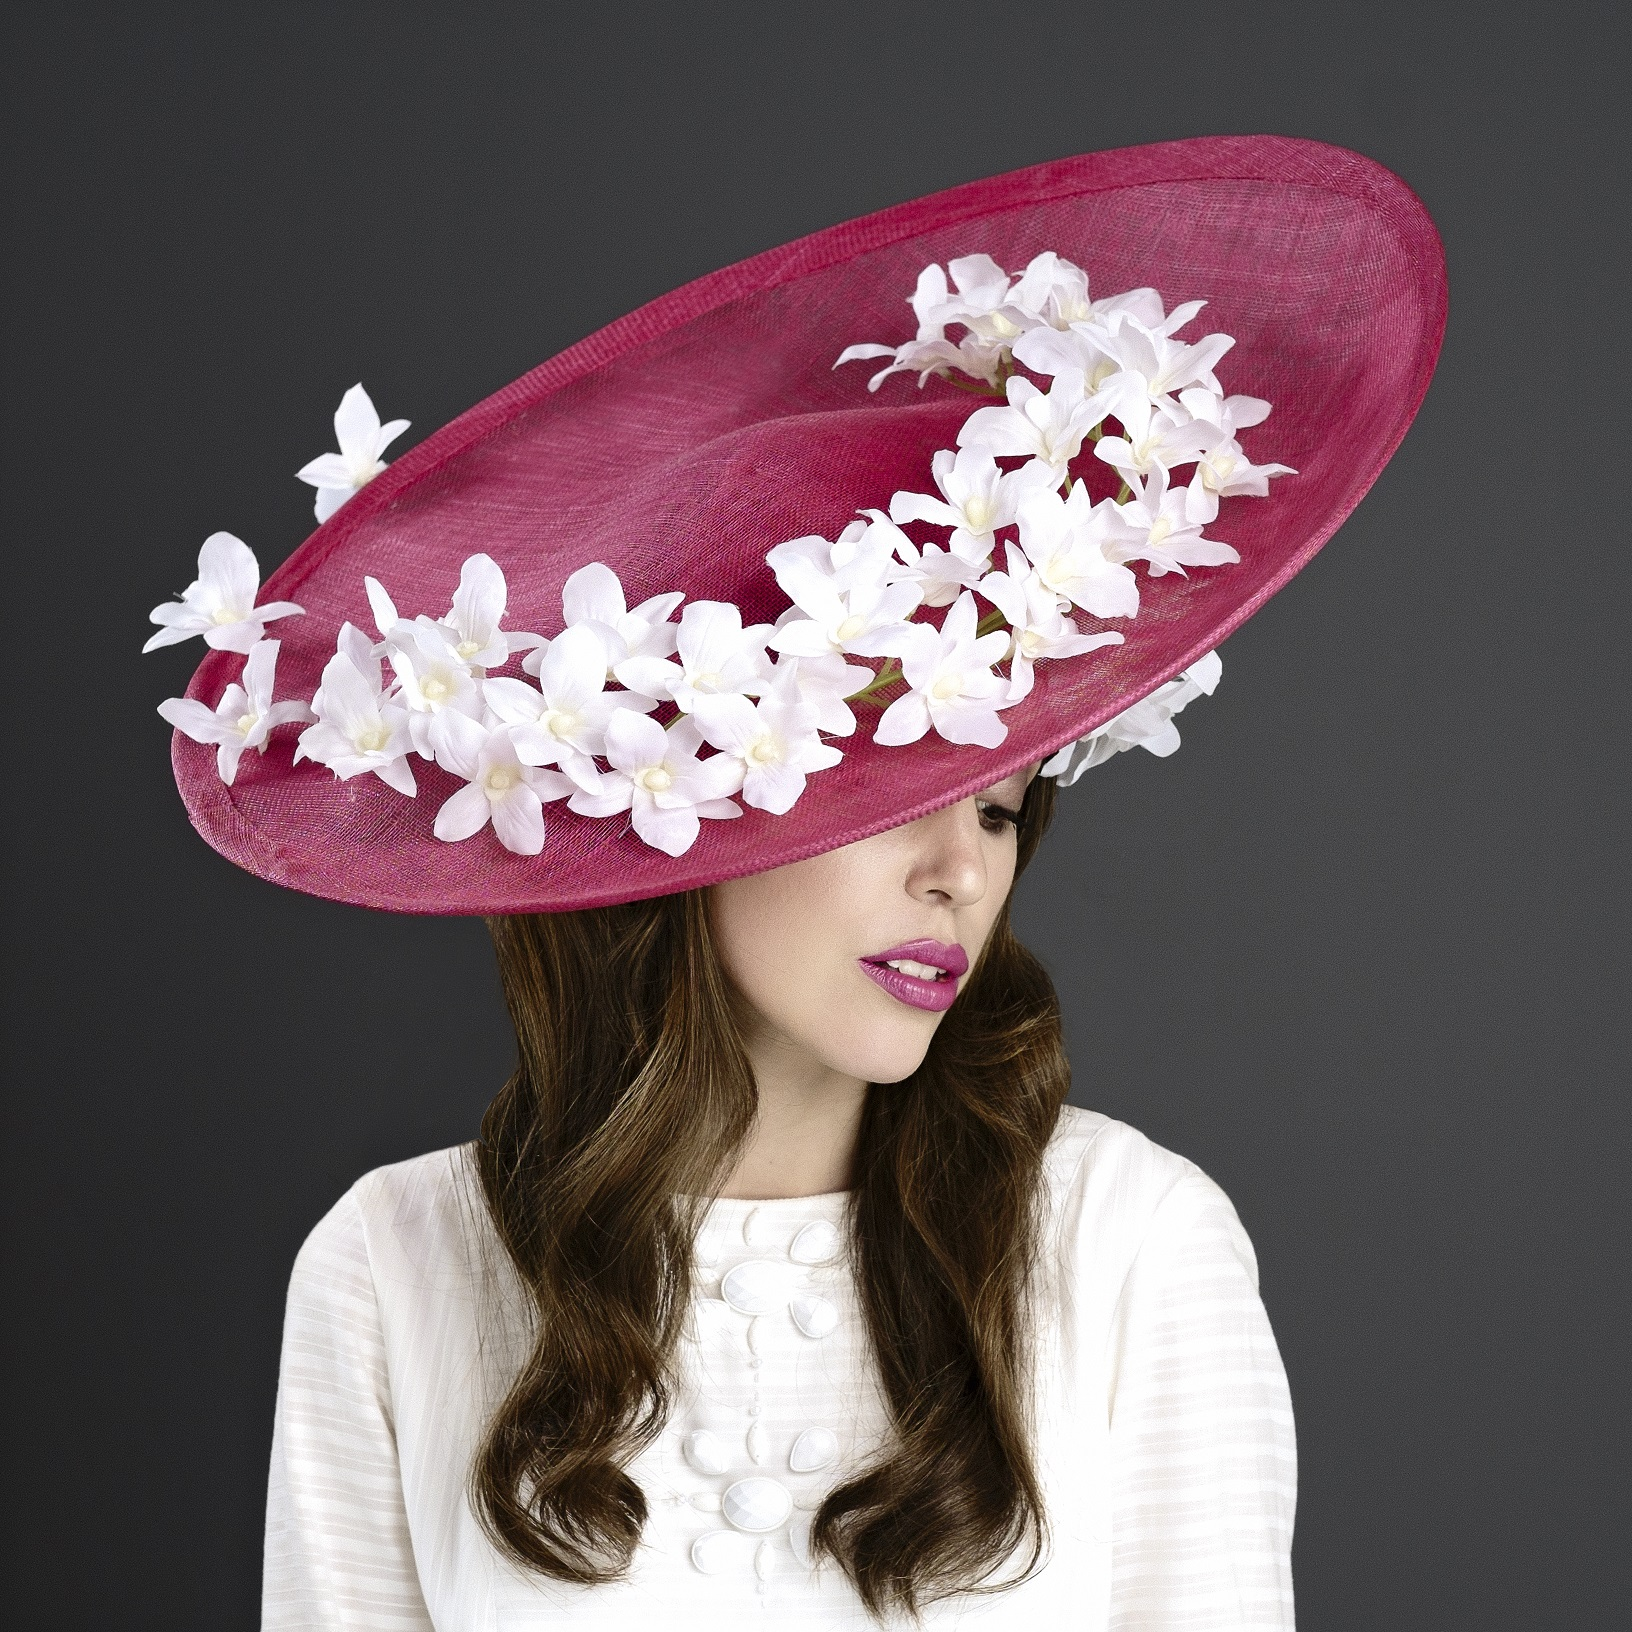 liz felix hat collection